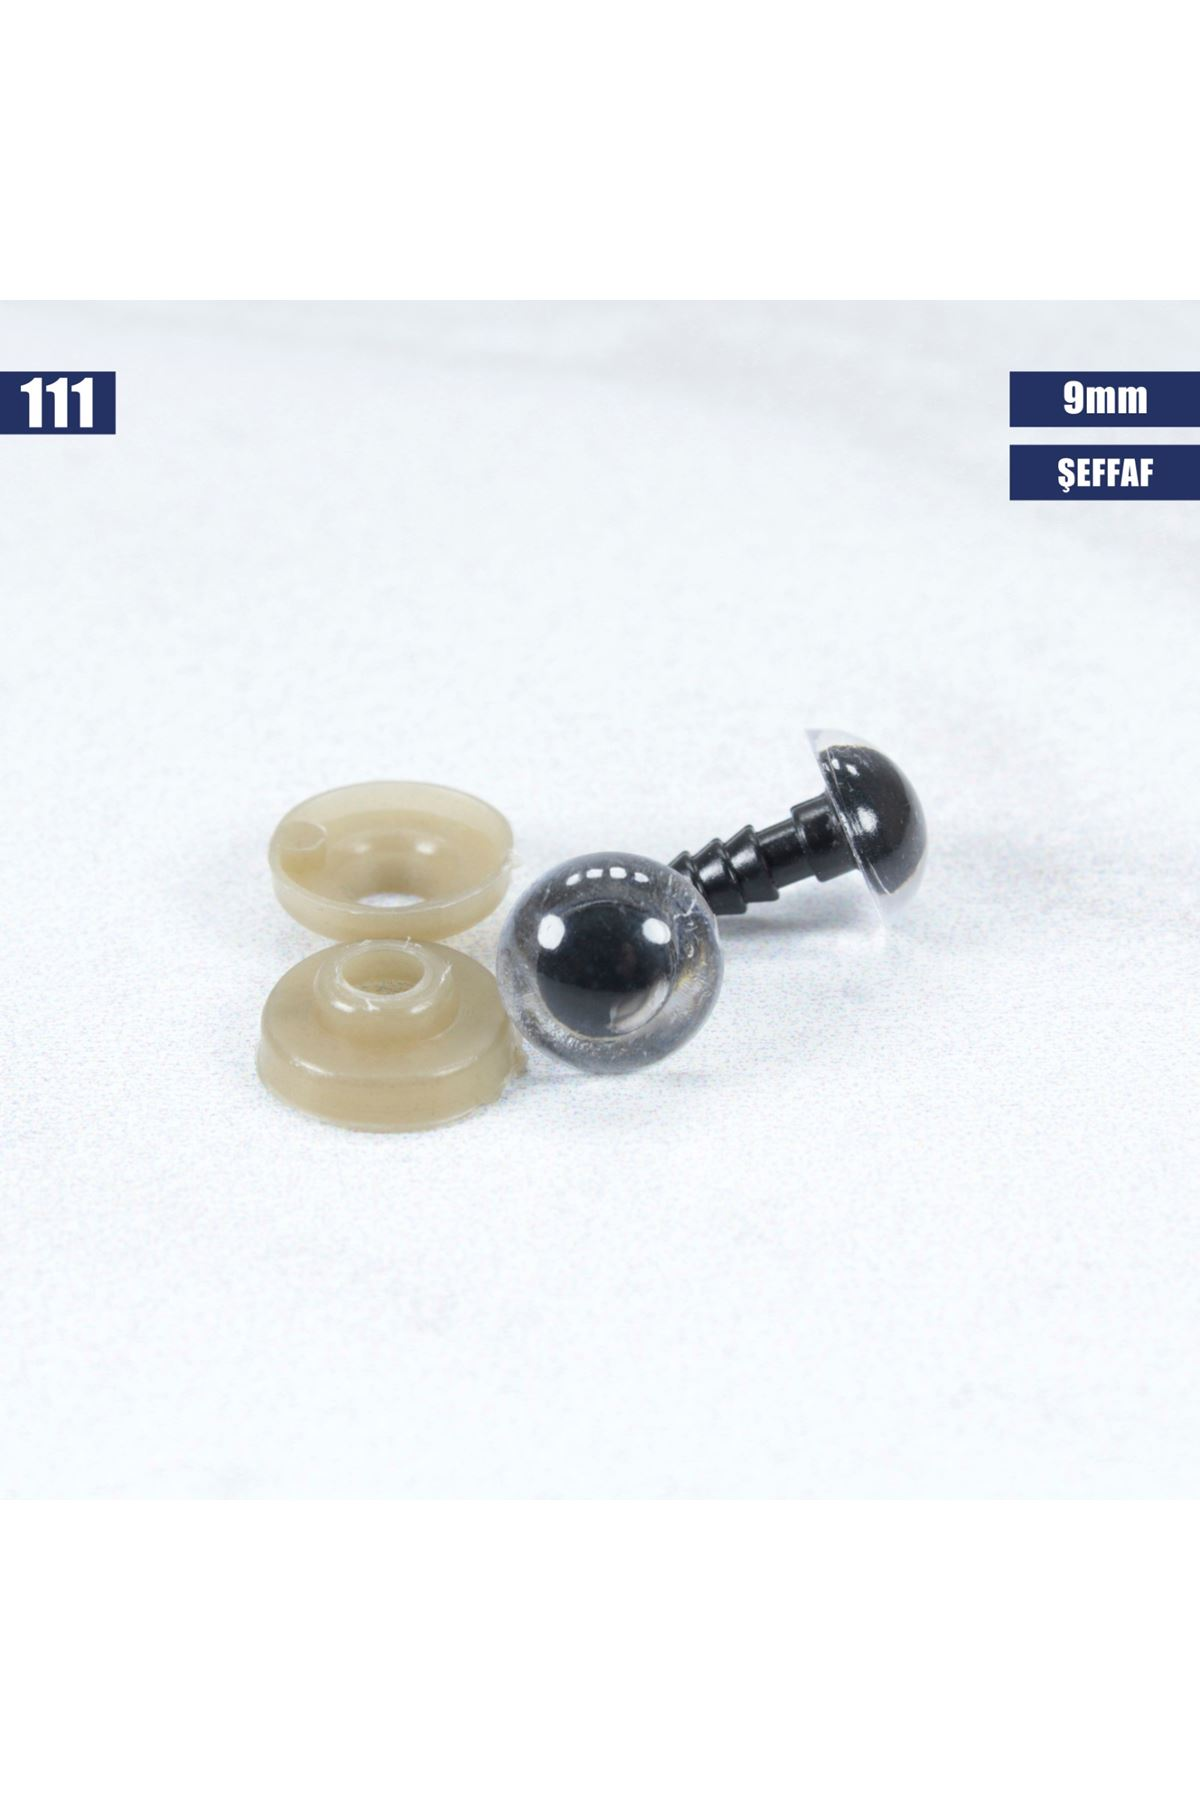 Şeffaf Vidalı Göz 9 mm 111